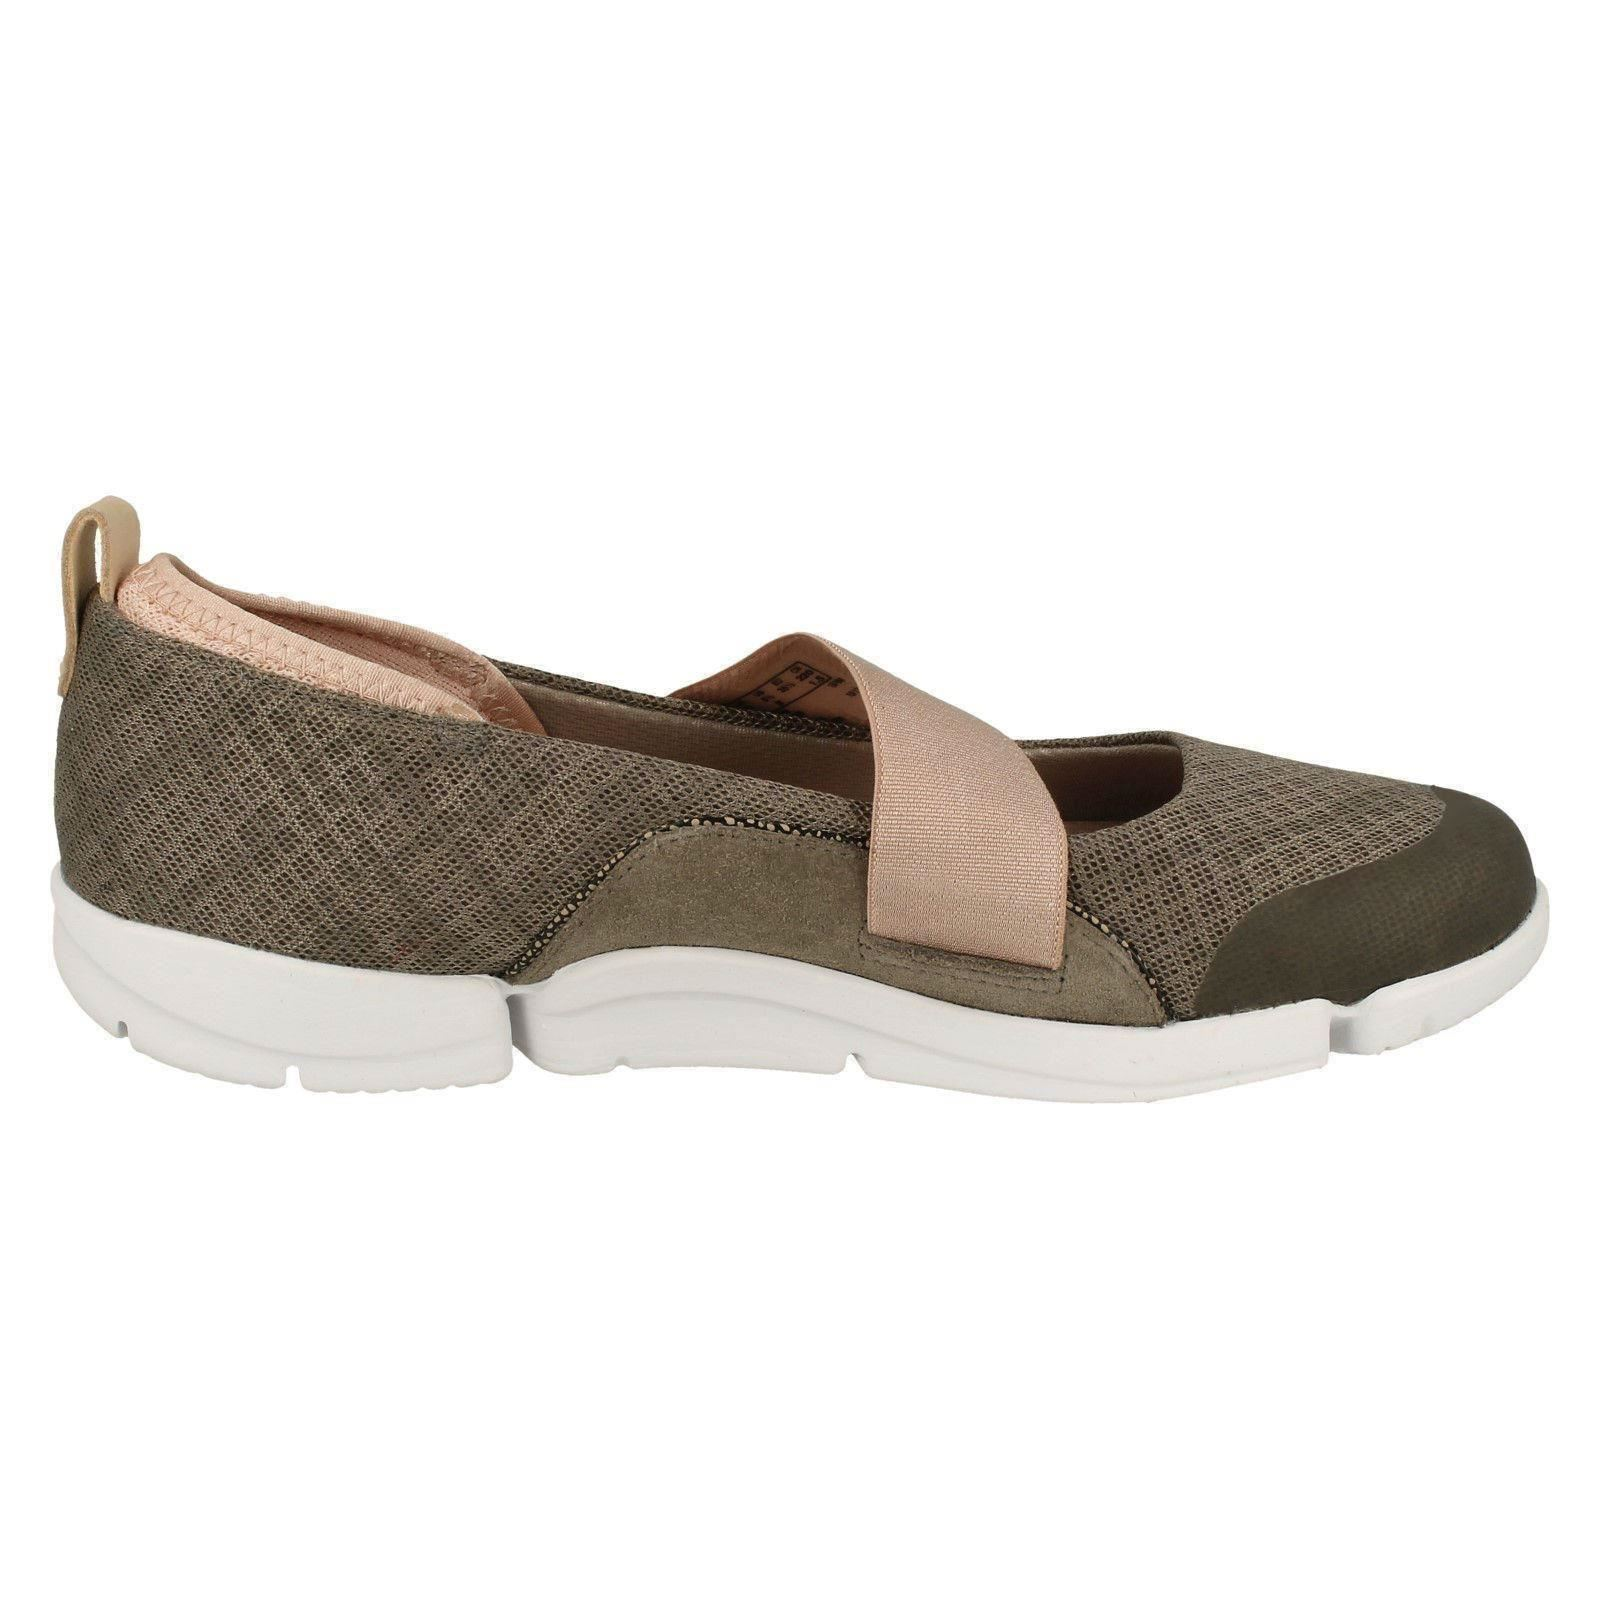 Ladies Clarks Casual Fashion Sports shoes shoes shoes 'Tri Allie' da7b54